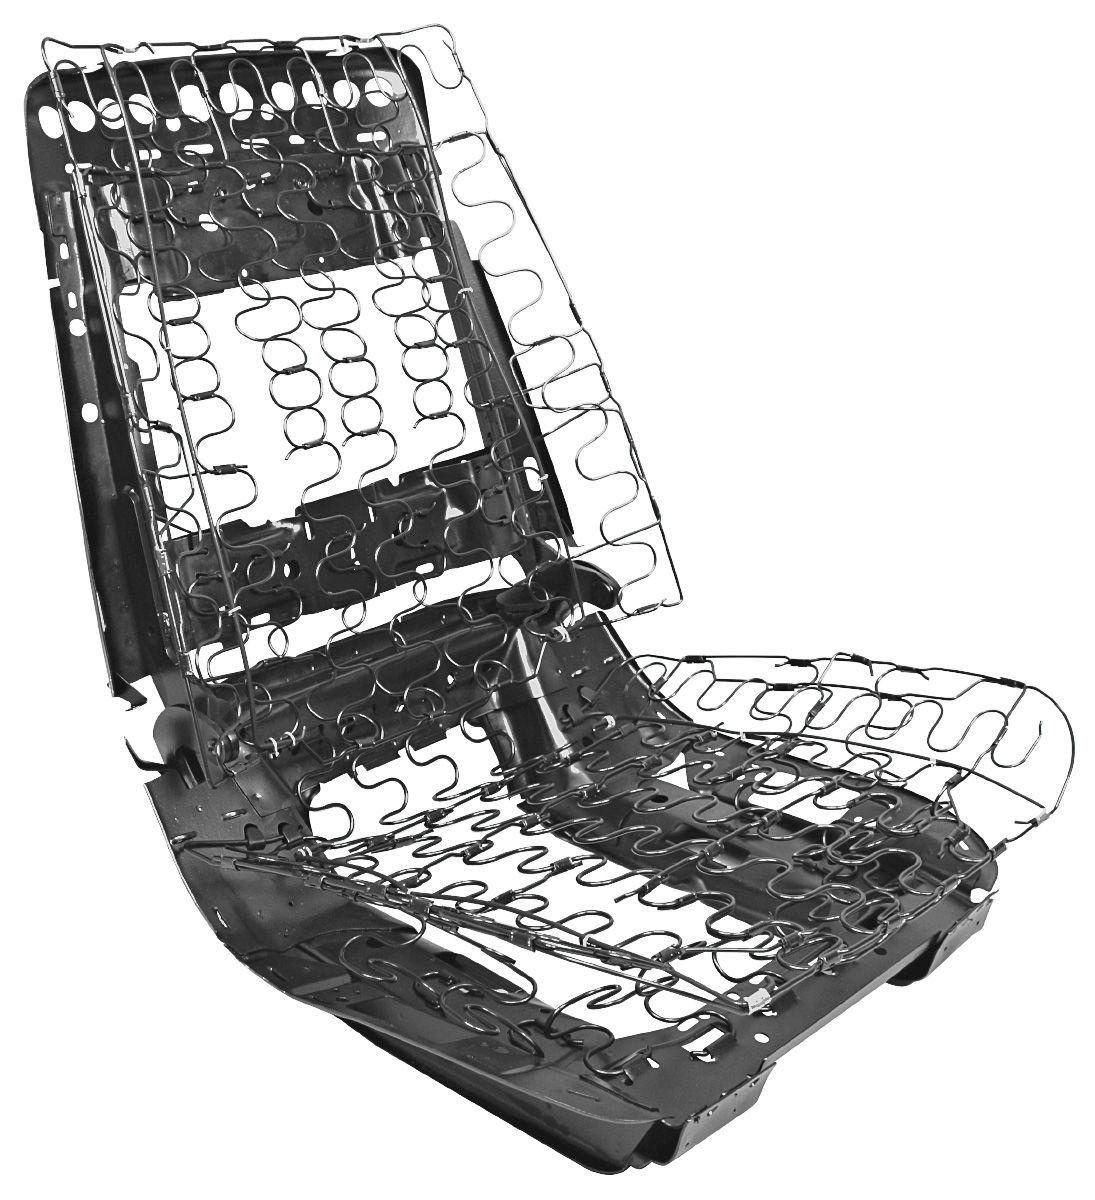 1967 wiring diagram buick skylark opgi